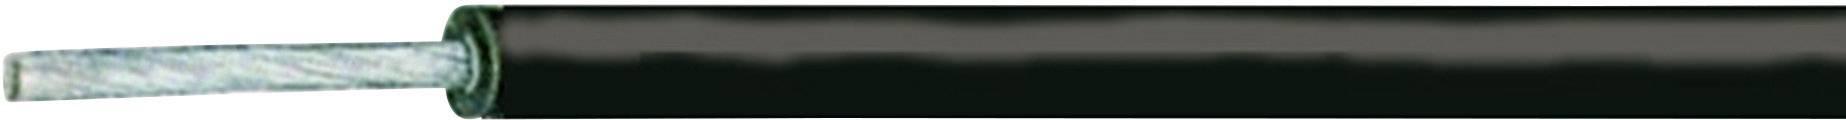 Stikalna žica SiL-SiAF 1 x 2.50 mm, rdeča, rjava XBK Kabel cena za meter